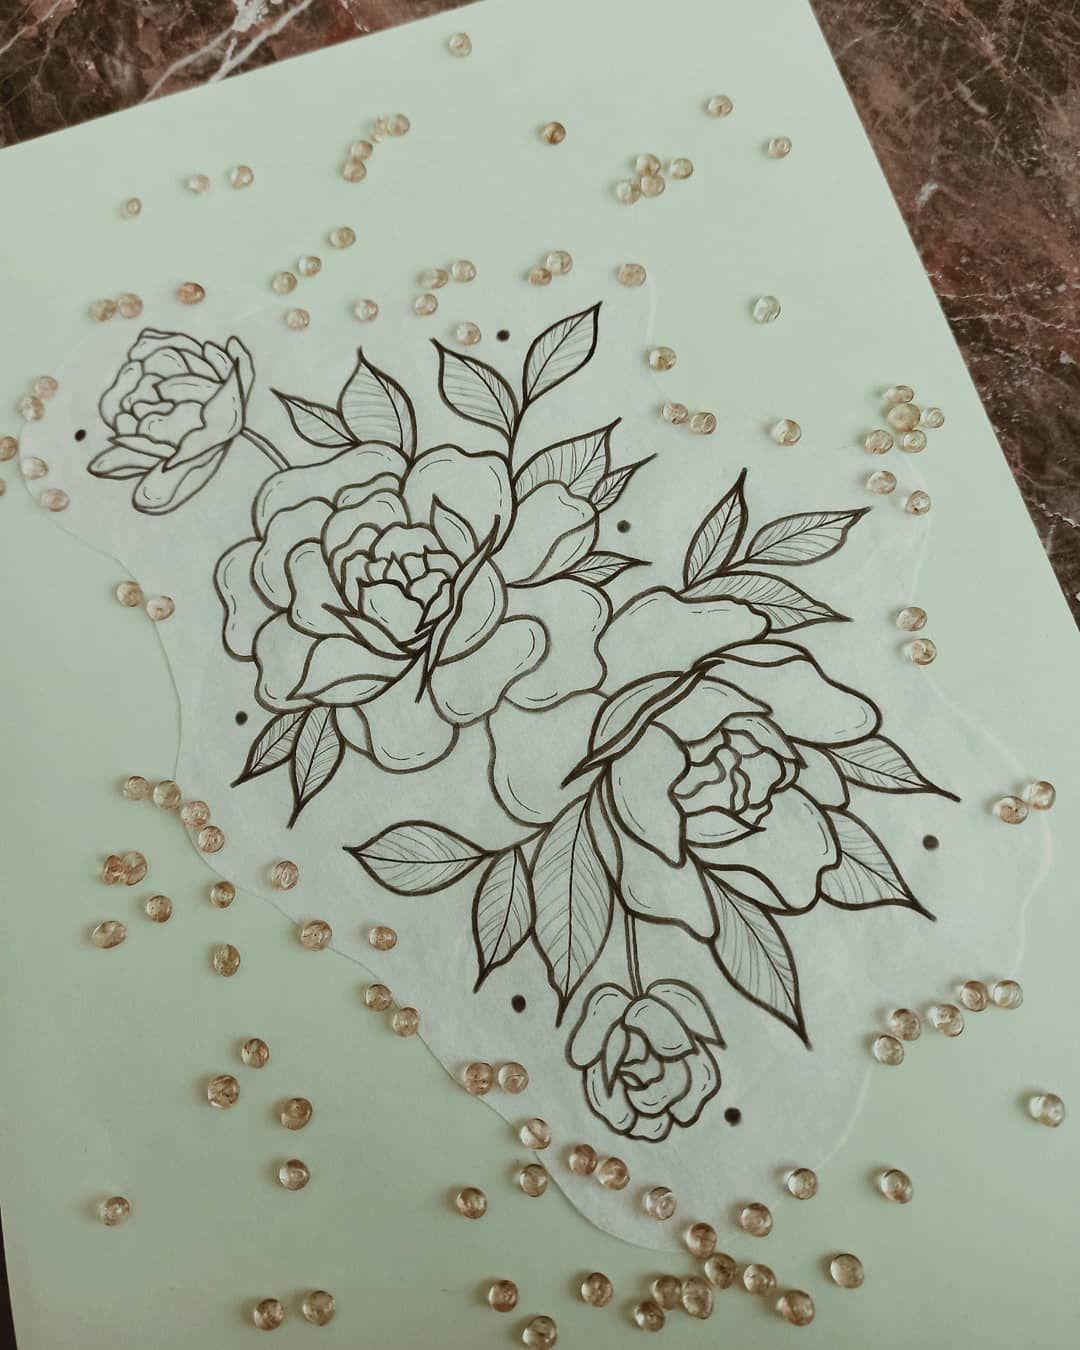 •✾✾✾• ▪ ▪ ▪ ▪ ▪ ▪ ▪ ▪ ▪ ▪ #floral #flowers #floraldesign #floraltattoo #floralart #flower #flowertattoo #flowerdrawing #rosetattoo #rosetattoodesign #roses #flashtattoo #flashwork #flashworkers #flashart #flashbook #flashaddicted #flash #artdesign #artoftheday #artistsoninstagram #art #tattooidea #tattooapprentice #tattooflash #tattoodesign #tattooideas #sketchoftheday #sketch_dailydose #megartica